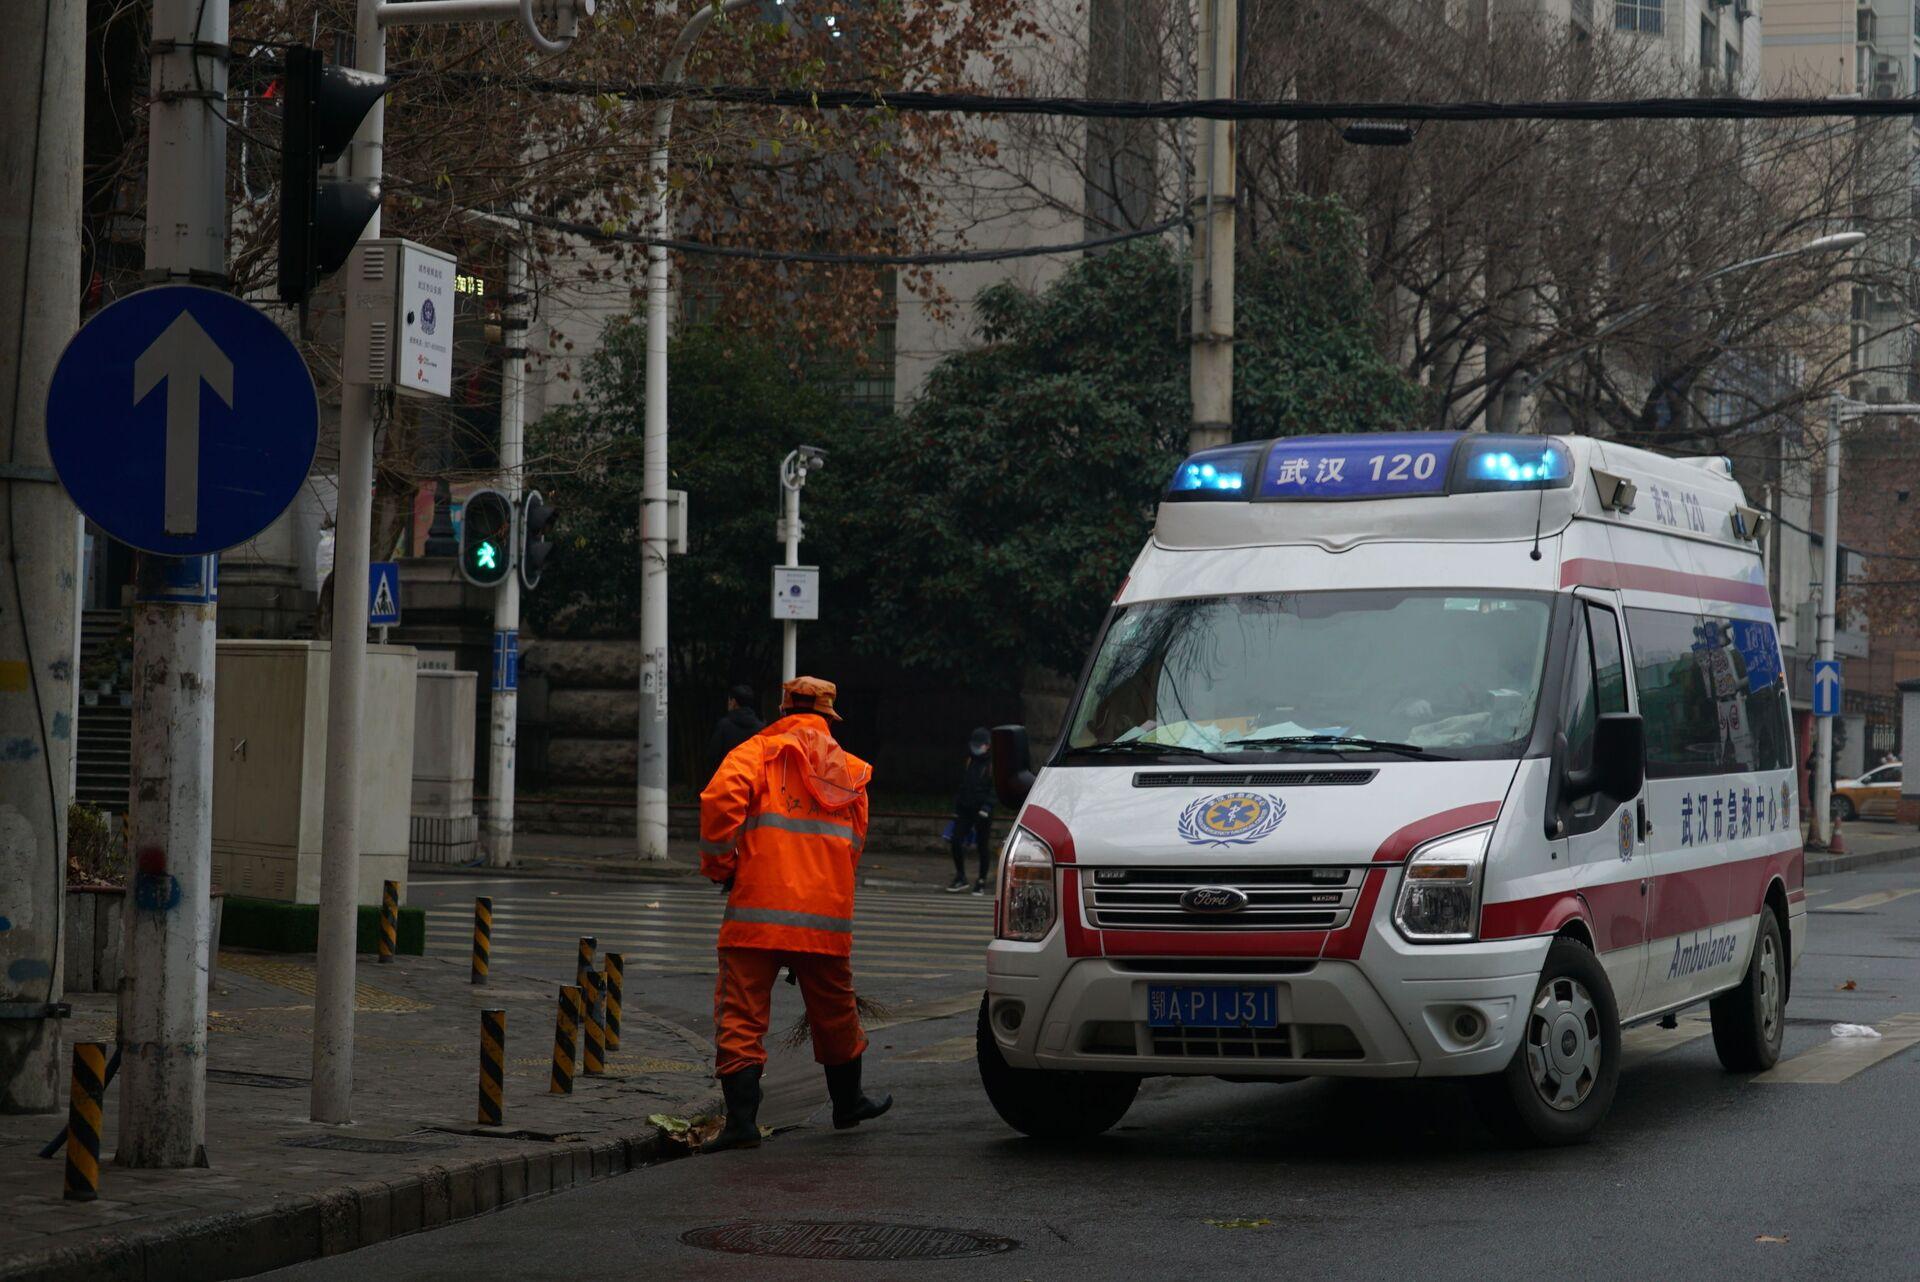 An ambulance in Wuhan, China - Sputnik International, 1920, 07.09.2021